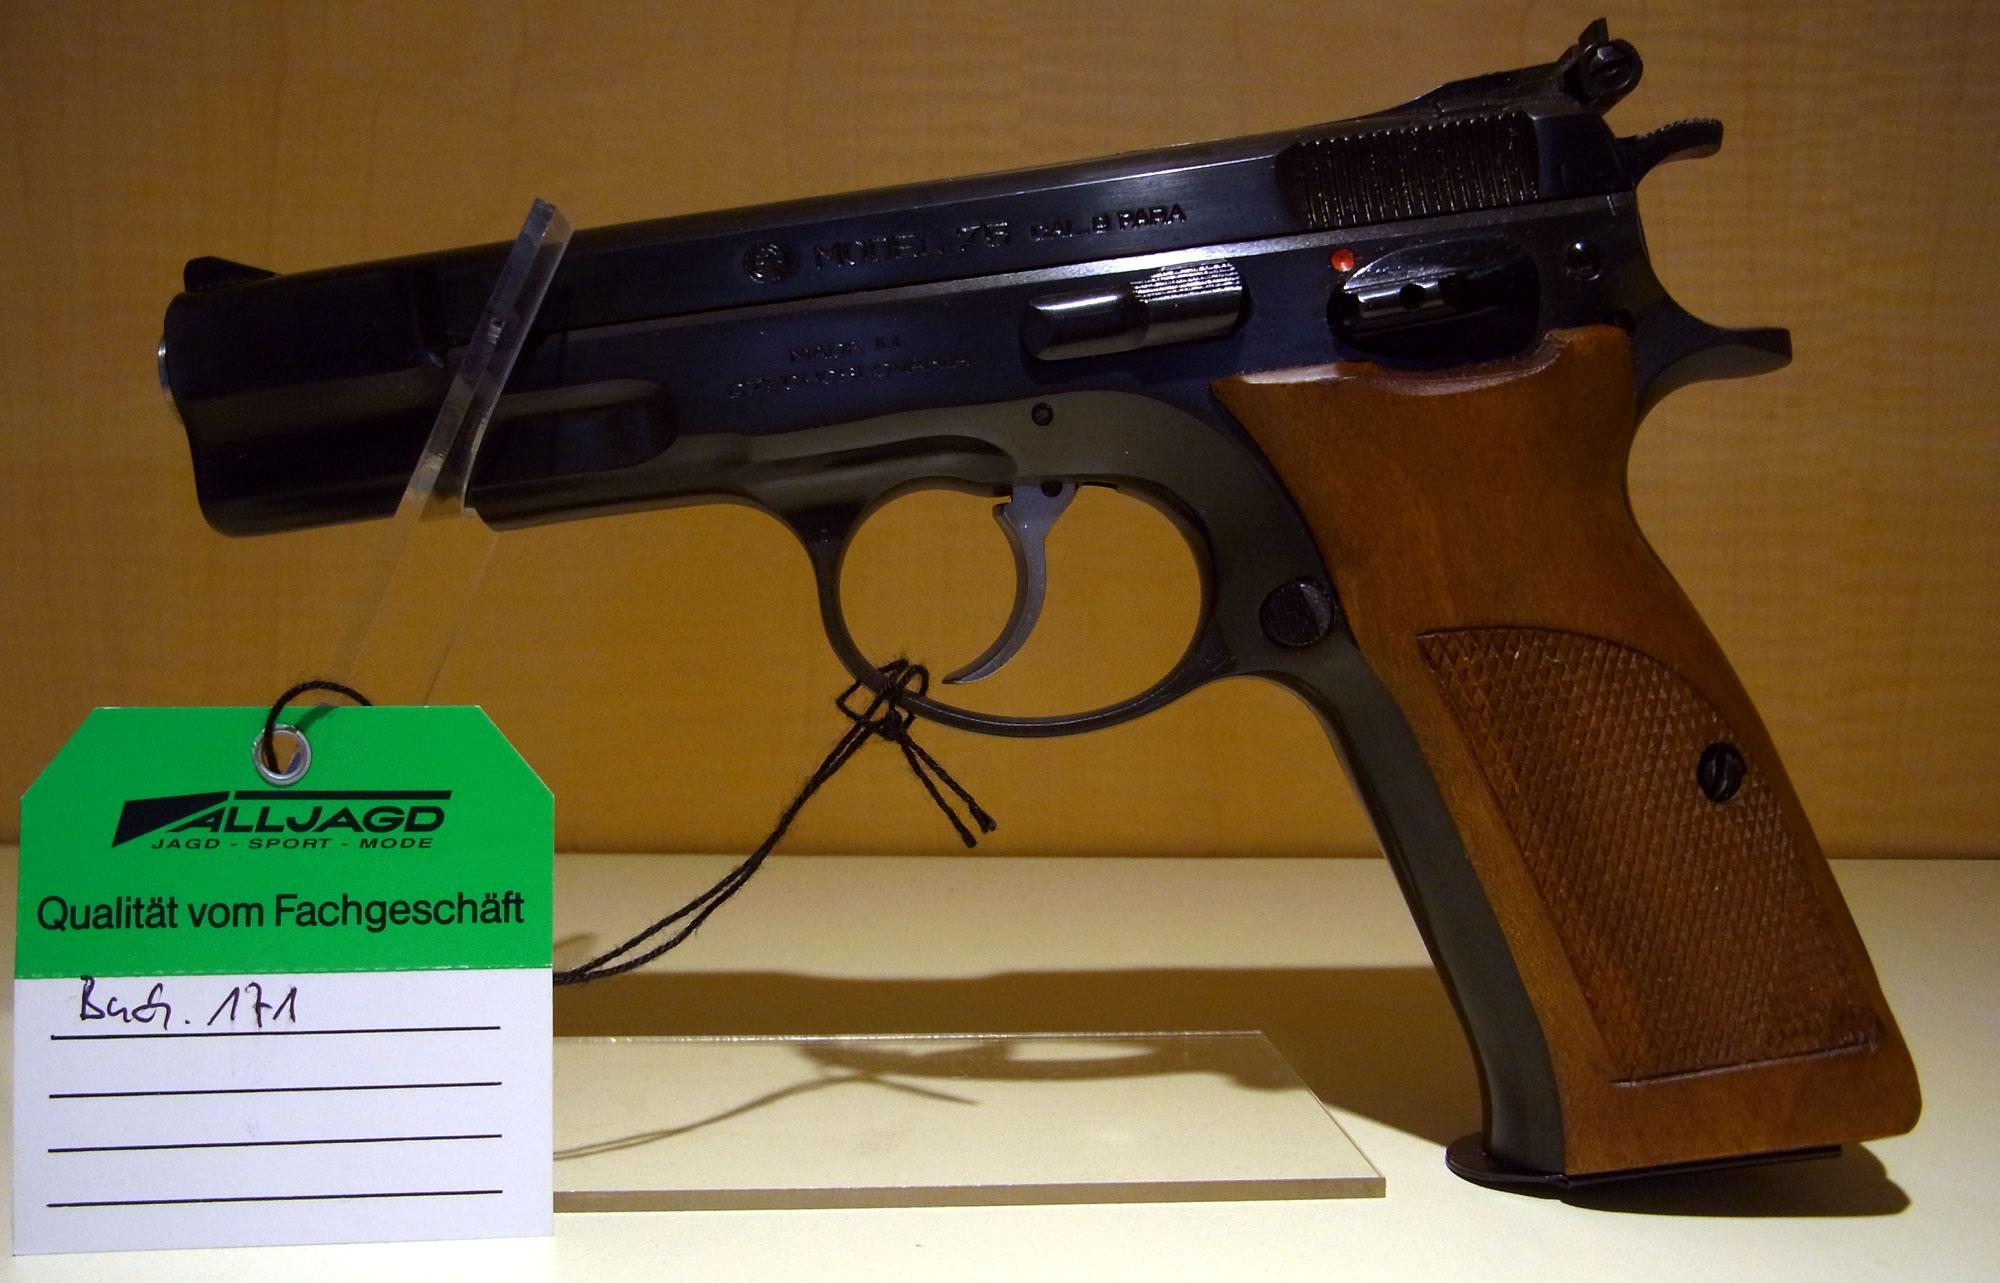 Brünner cz 75 kal. 9mm luger 350.00 u20ac waffen reinig.de